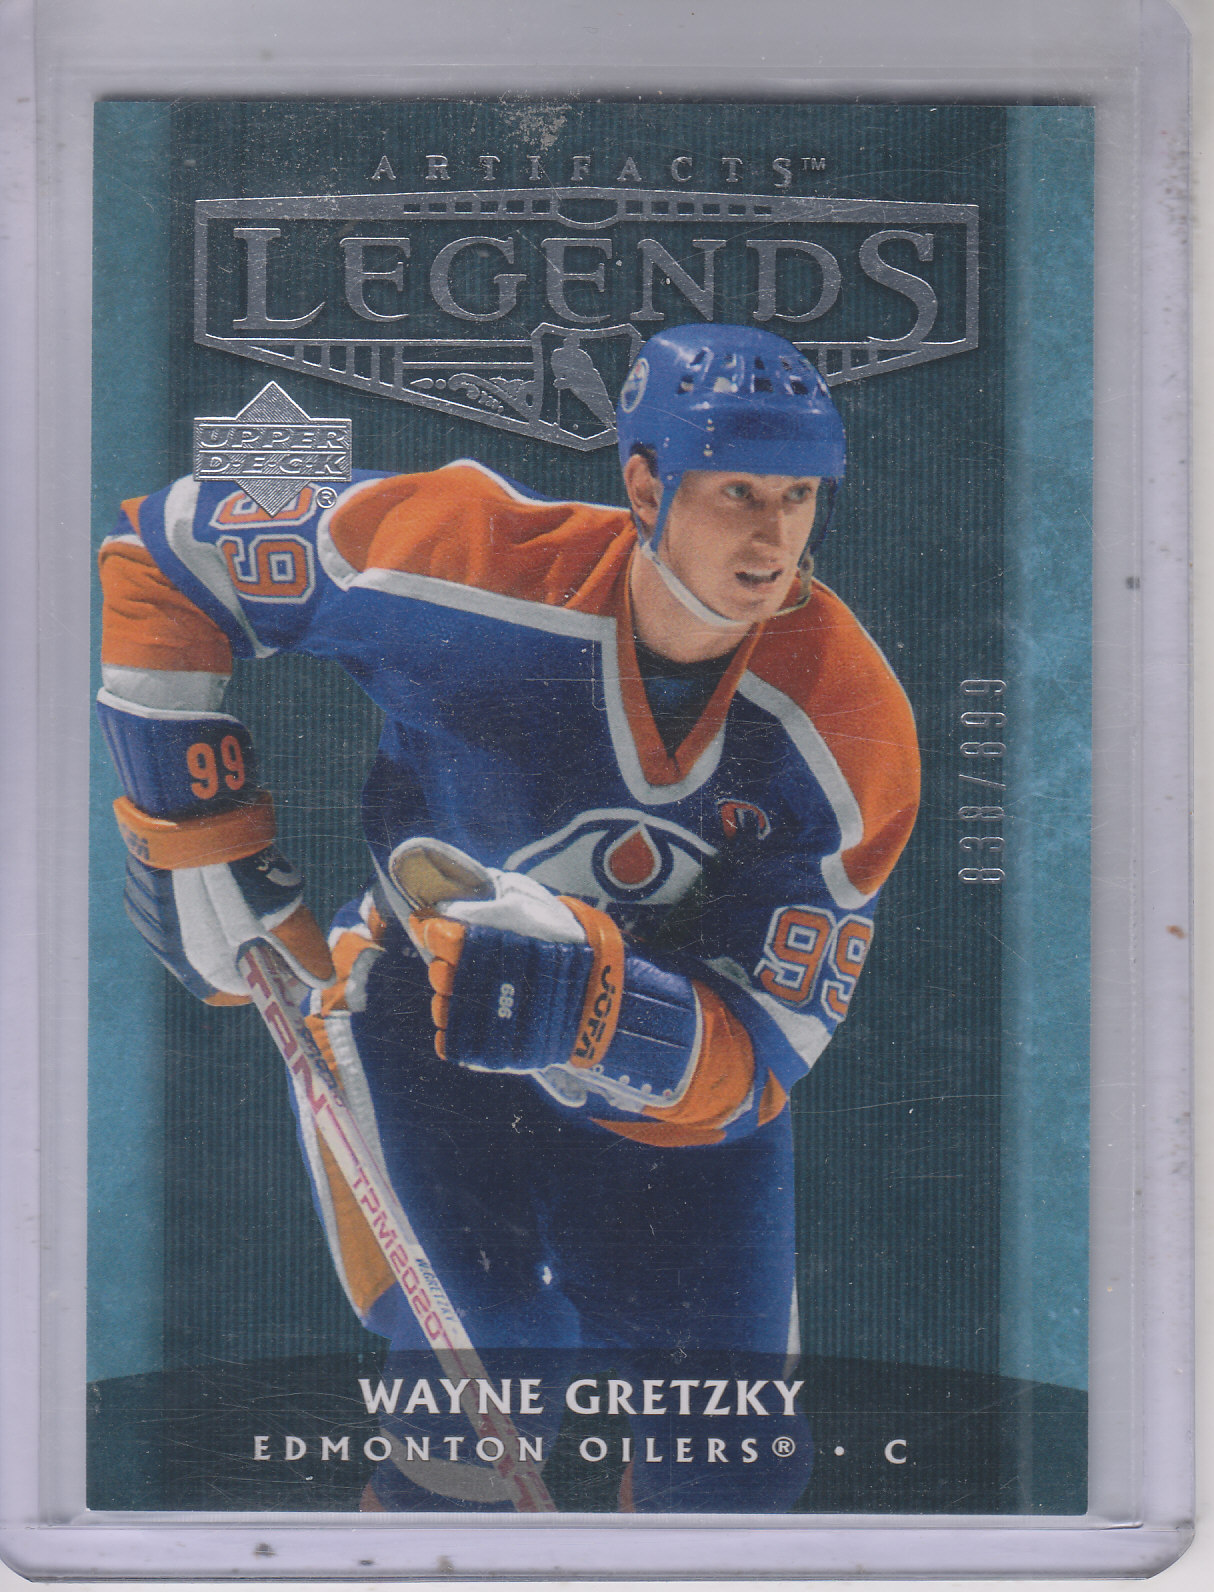 2005-06 Artifacts #113 Wayne Gretzky AL